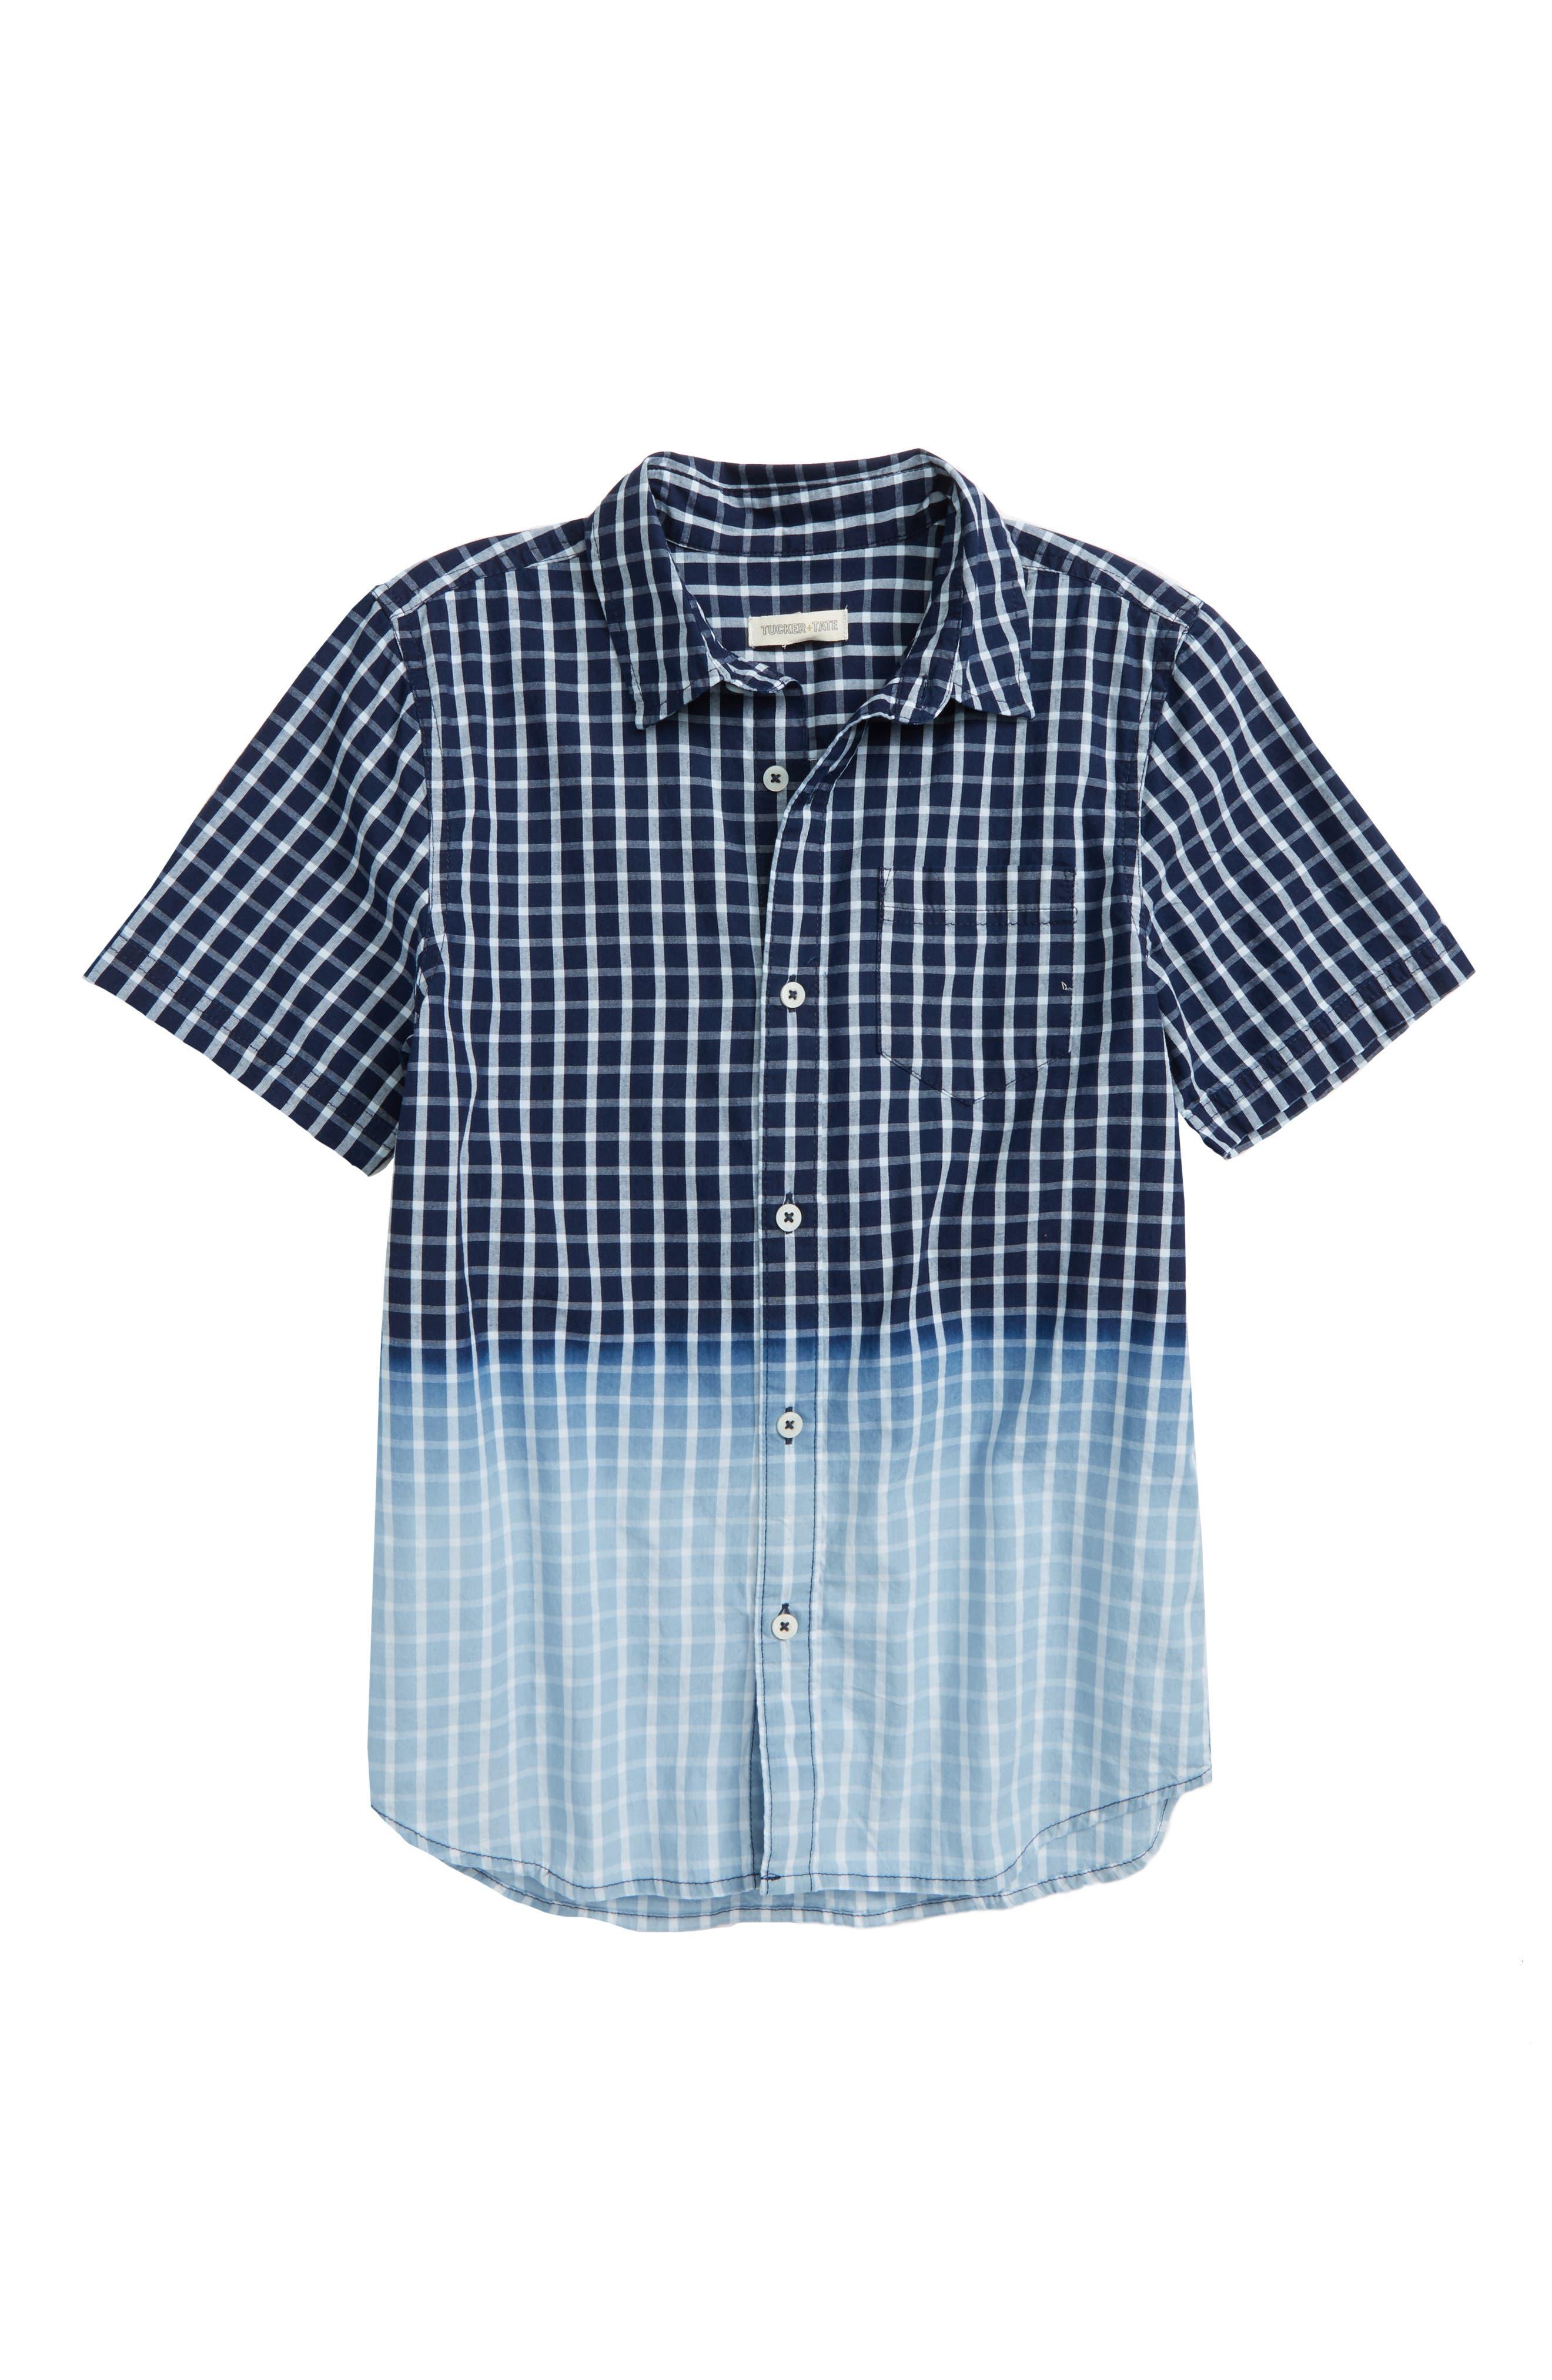 Dip Dye Check Shirt,                         Main,                         color, Navy Denim Plaid